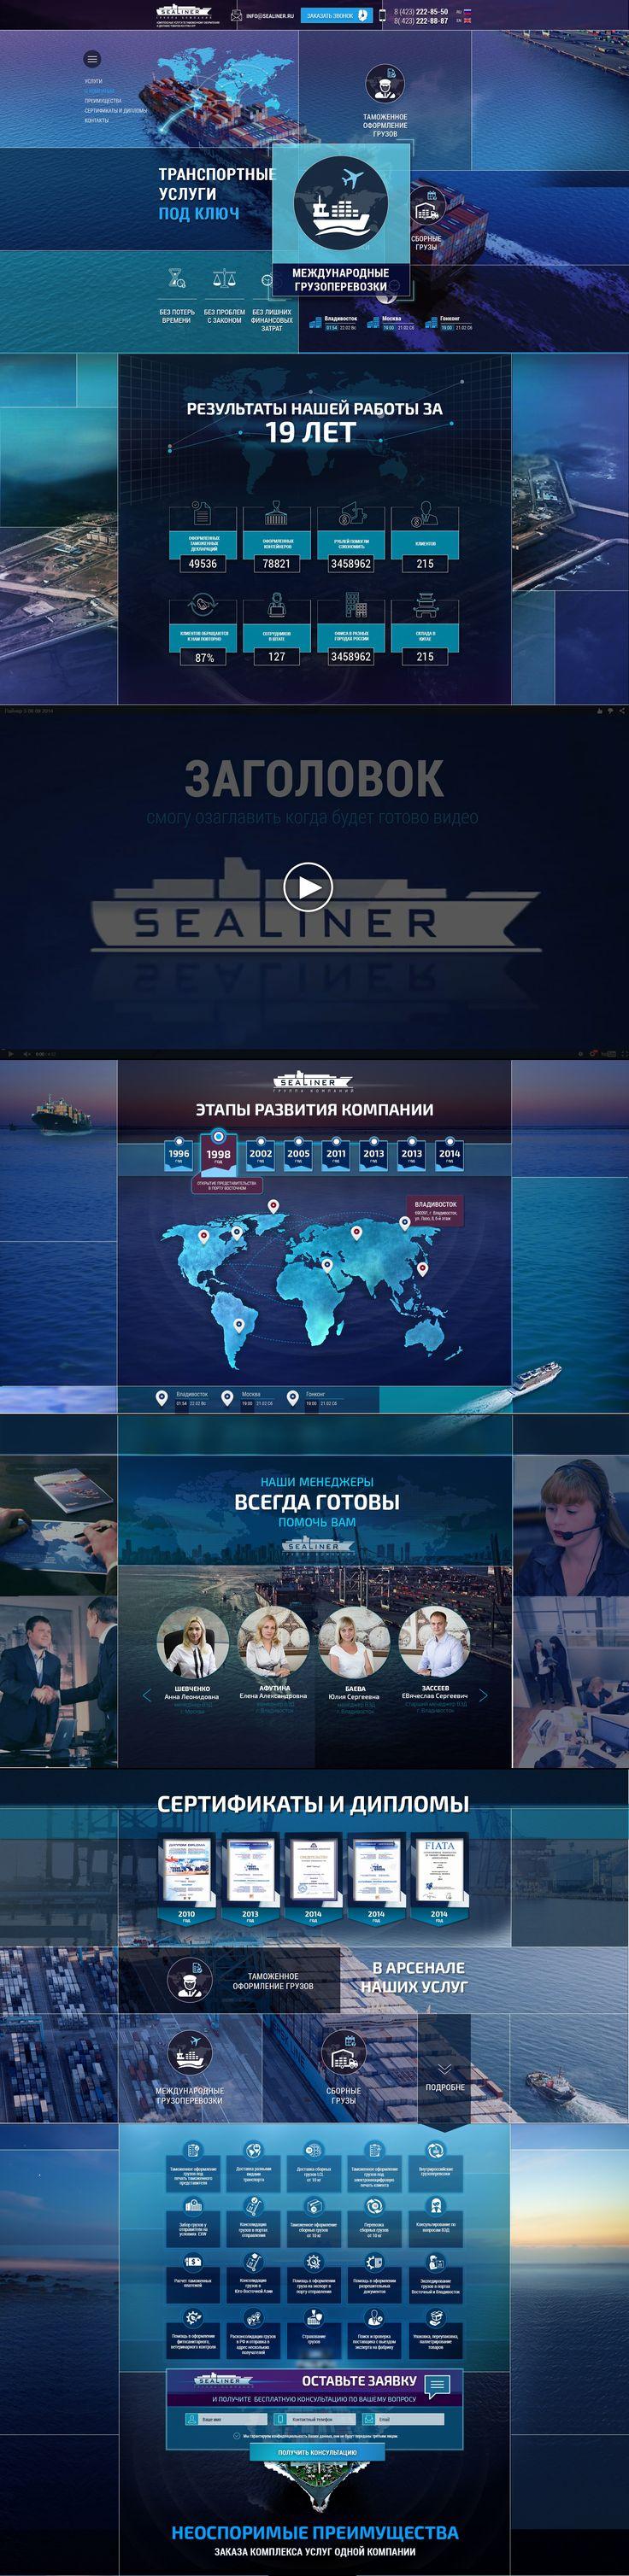 """SEALINER"" Logistic Company  #landing, #page, #design, #web, #HTML5, #photoshop, #website, #cms, #joomla"